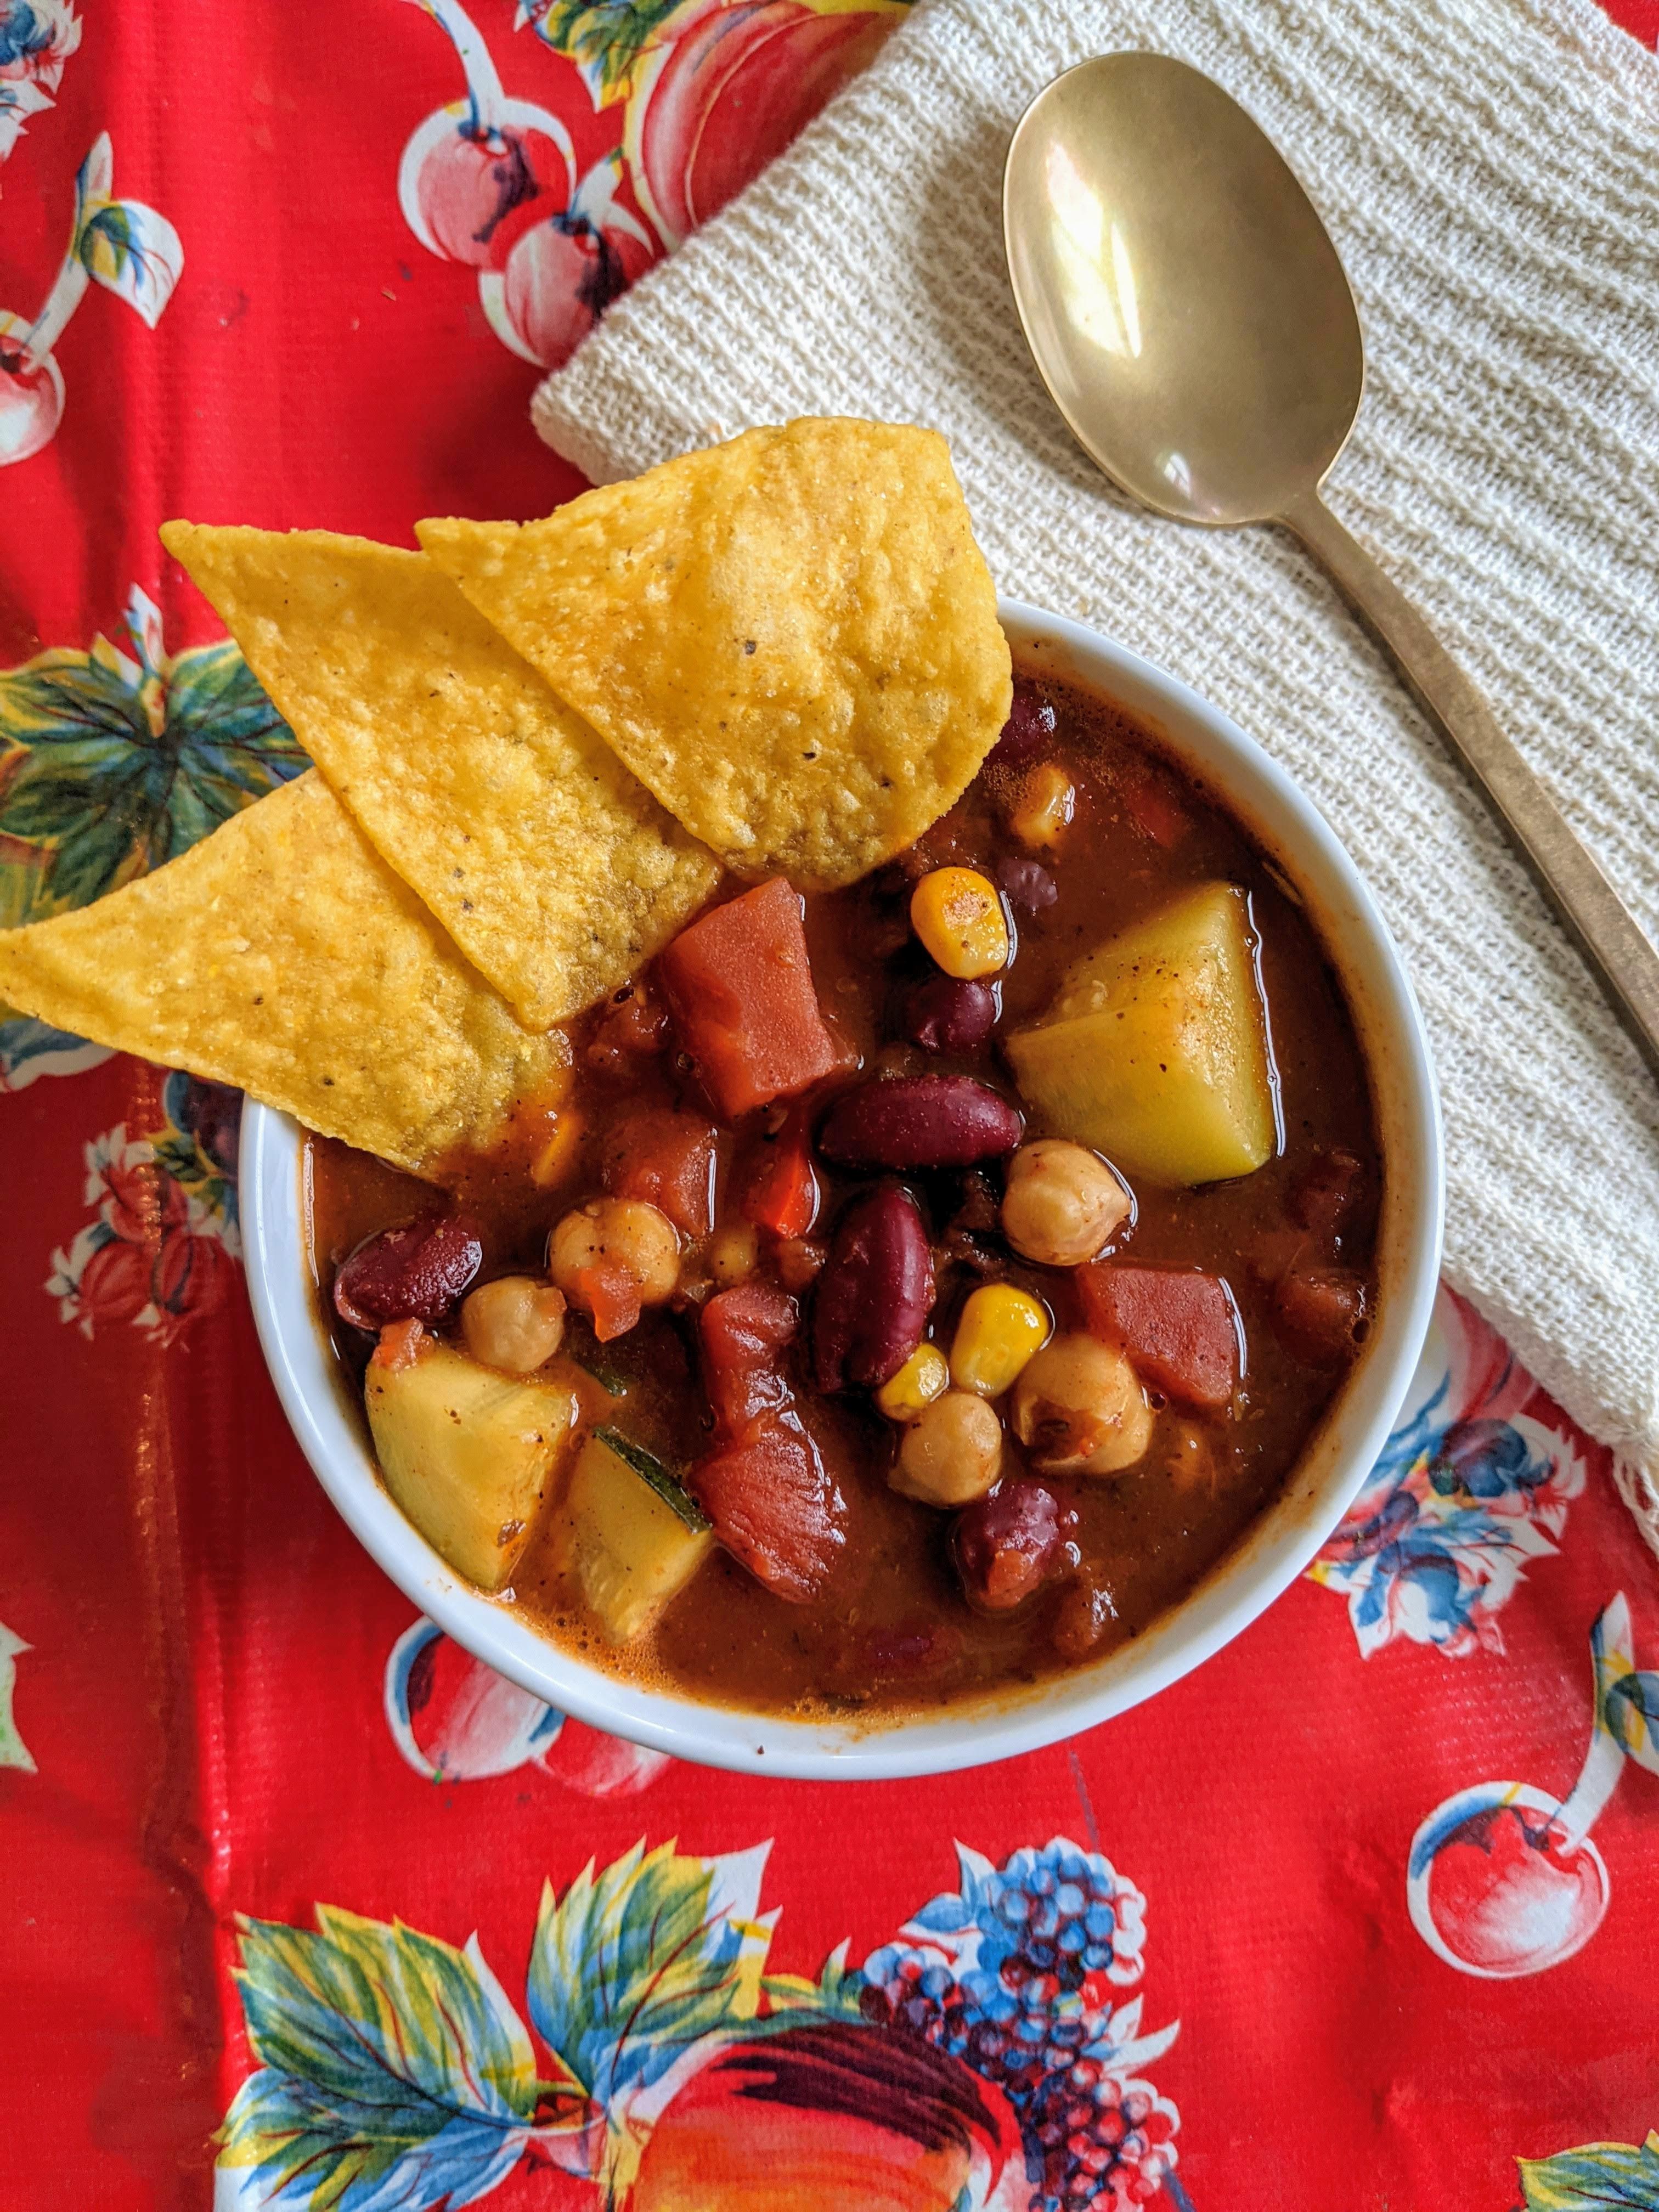 Homemade Slow Cooker Vegan Chili